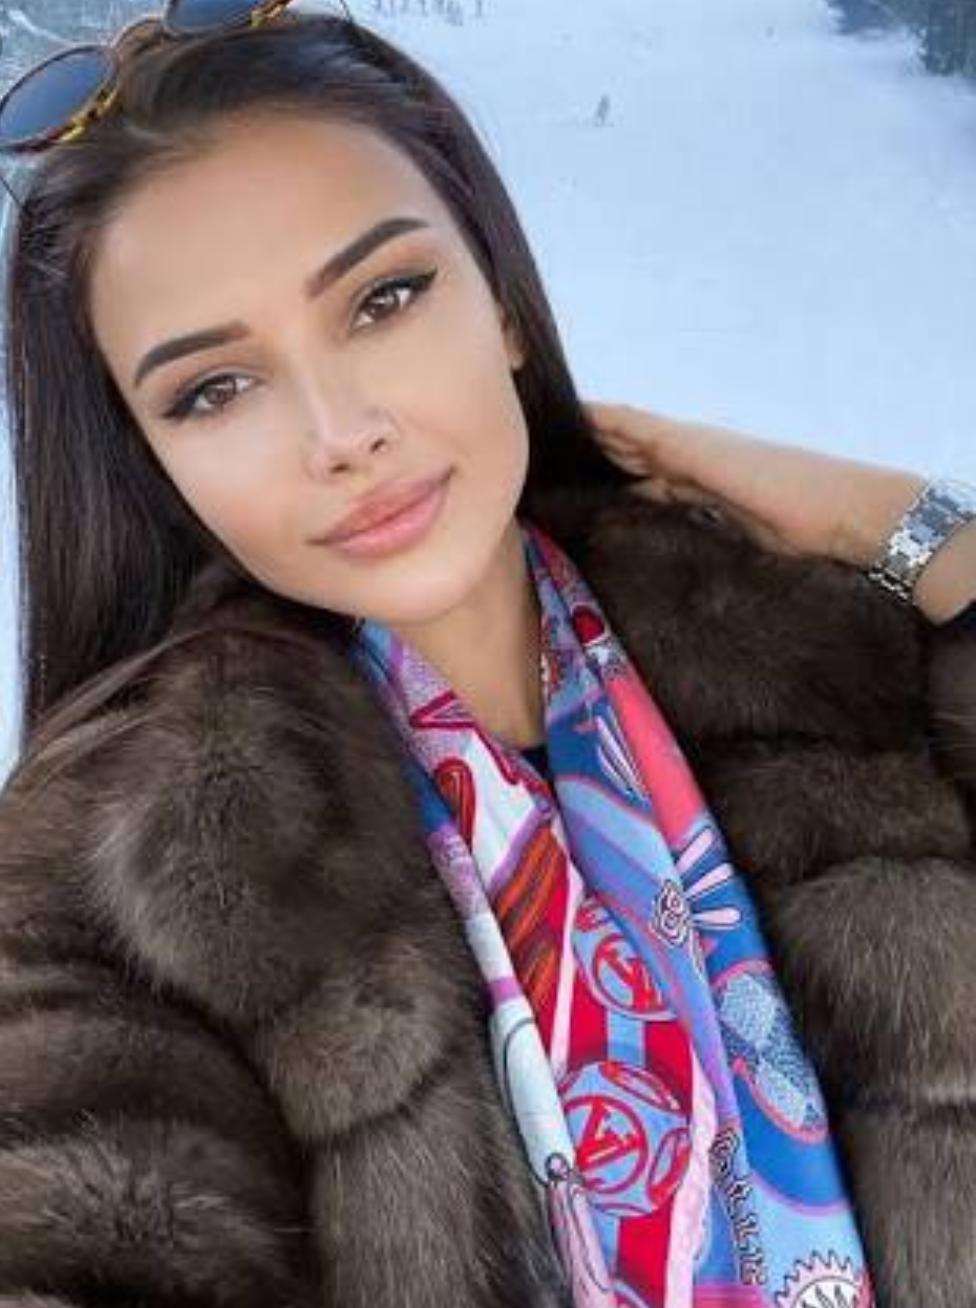 Wanita Cantik ini Dibayar Rp 70 Juta Dalam Sehari, Pekerjaannya Hanya Menjadi Pendamping Pangeran Kerajaan